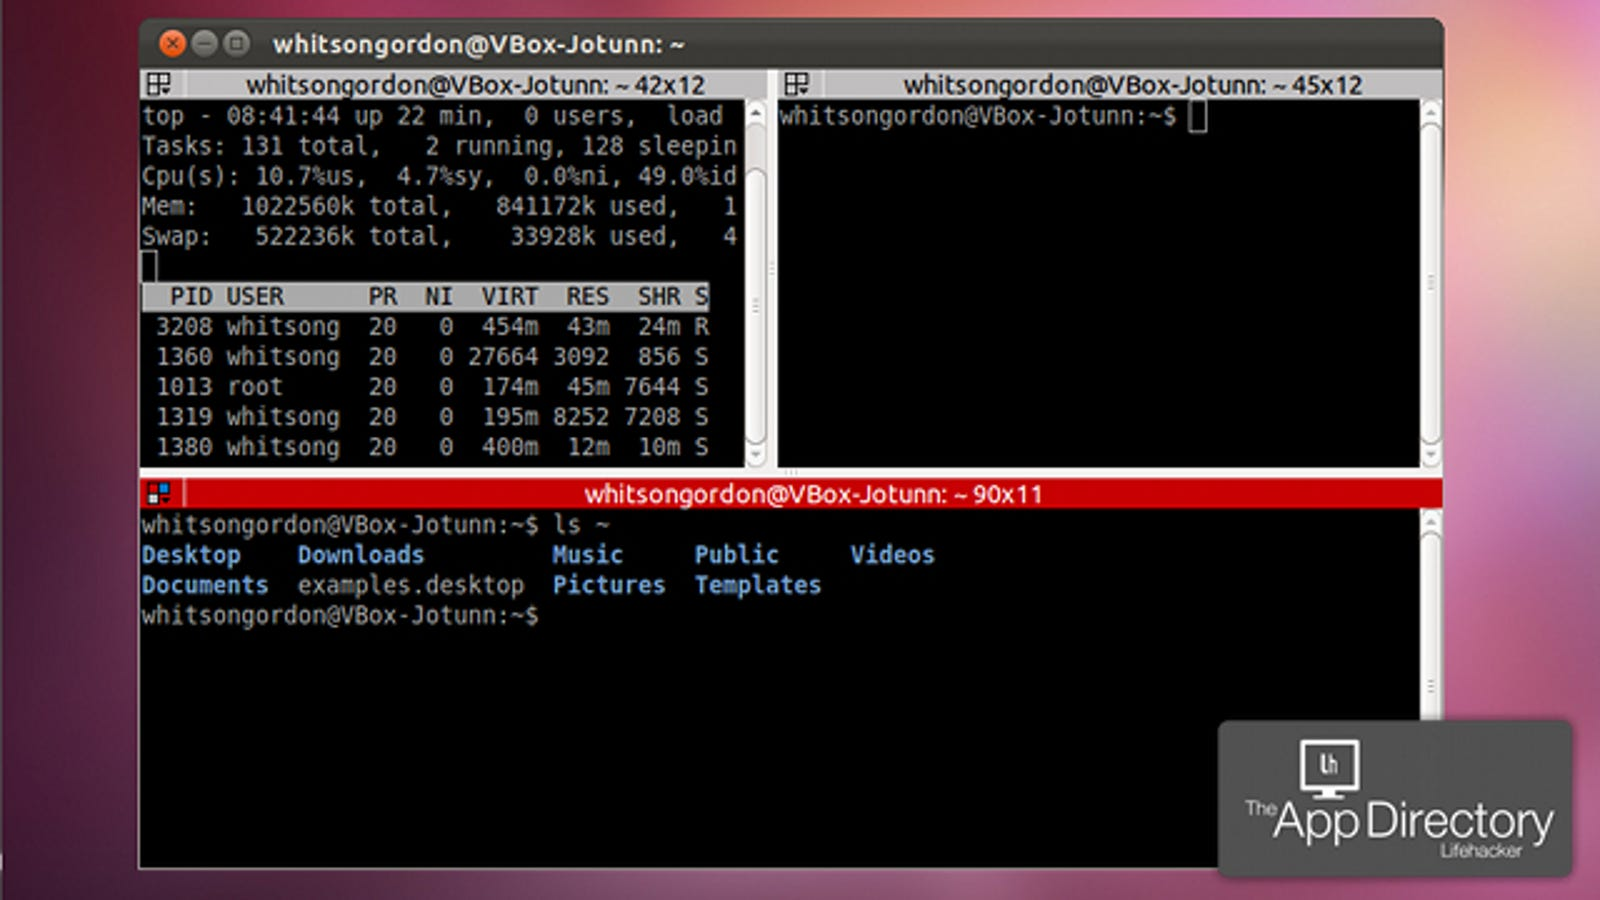 Terminal emulator   Terminal Emulator for Android - 2019-02-08